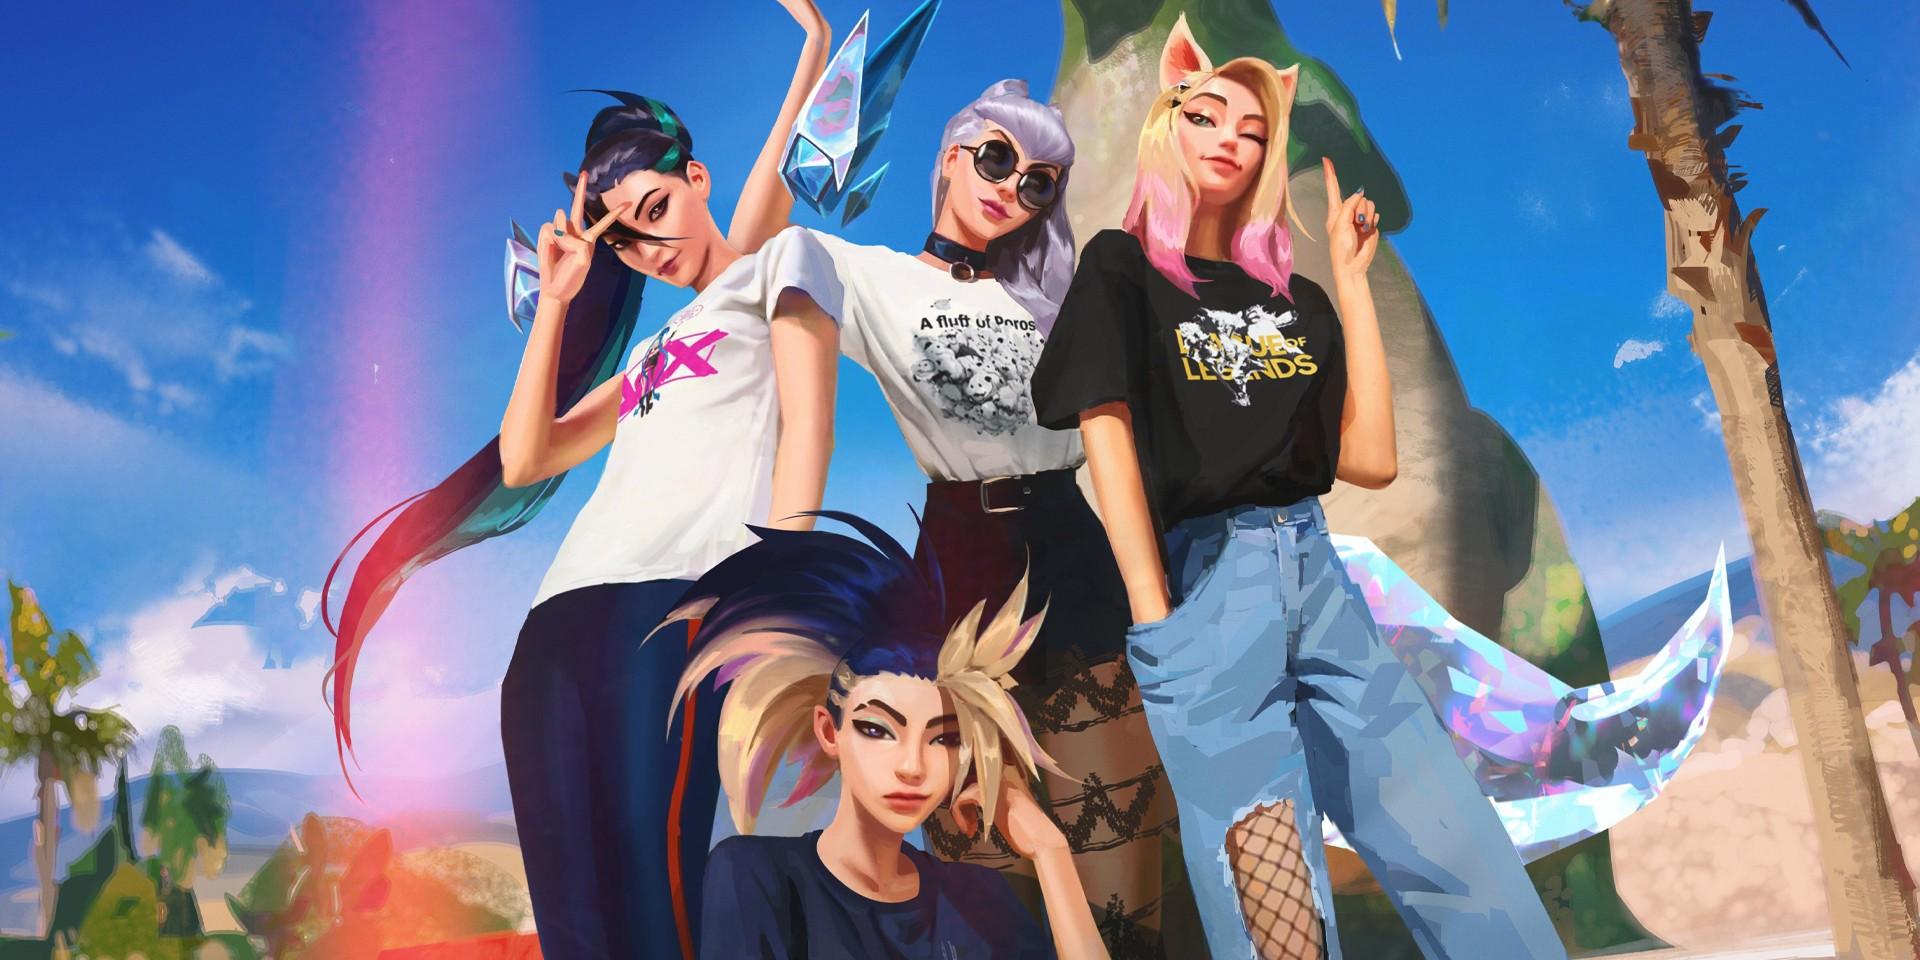 Riot Games collaborates with Uniqlo for exclusive League of Legends, K/DA merch